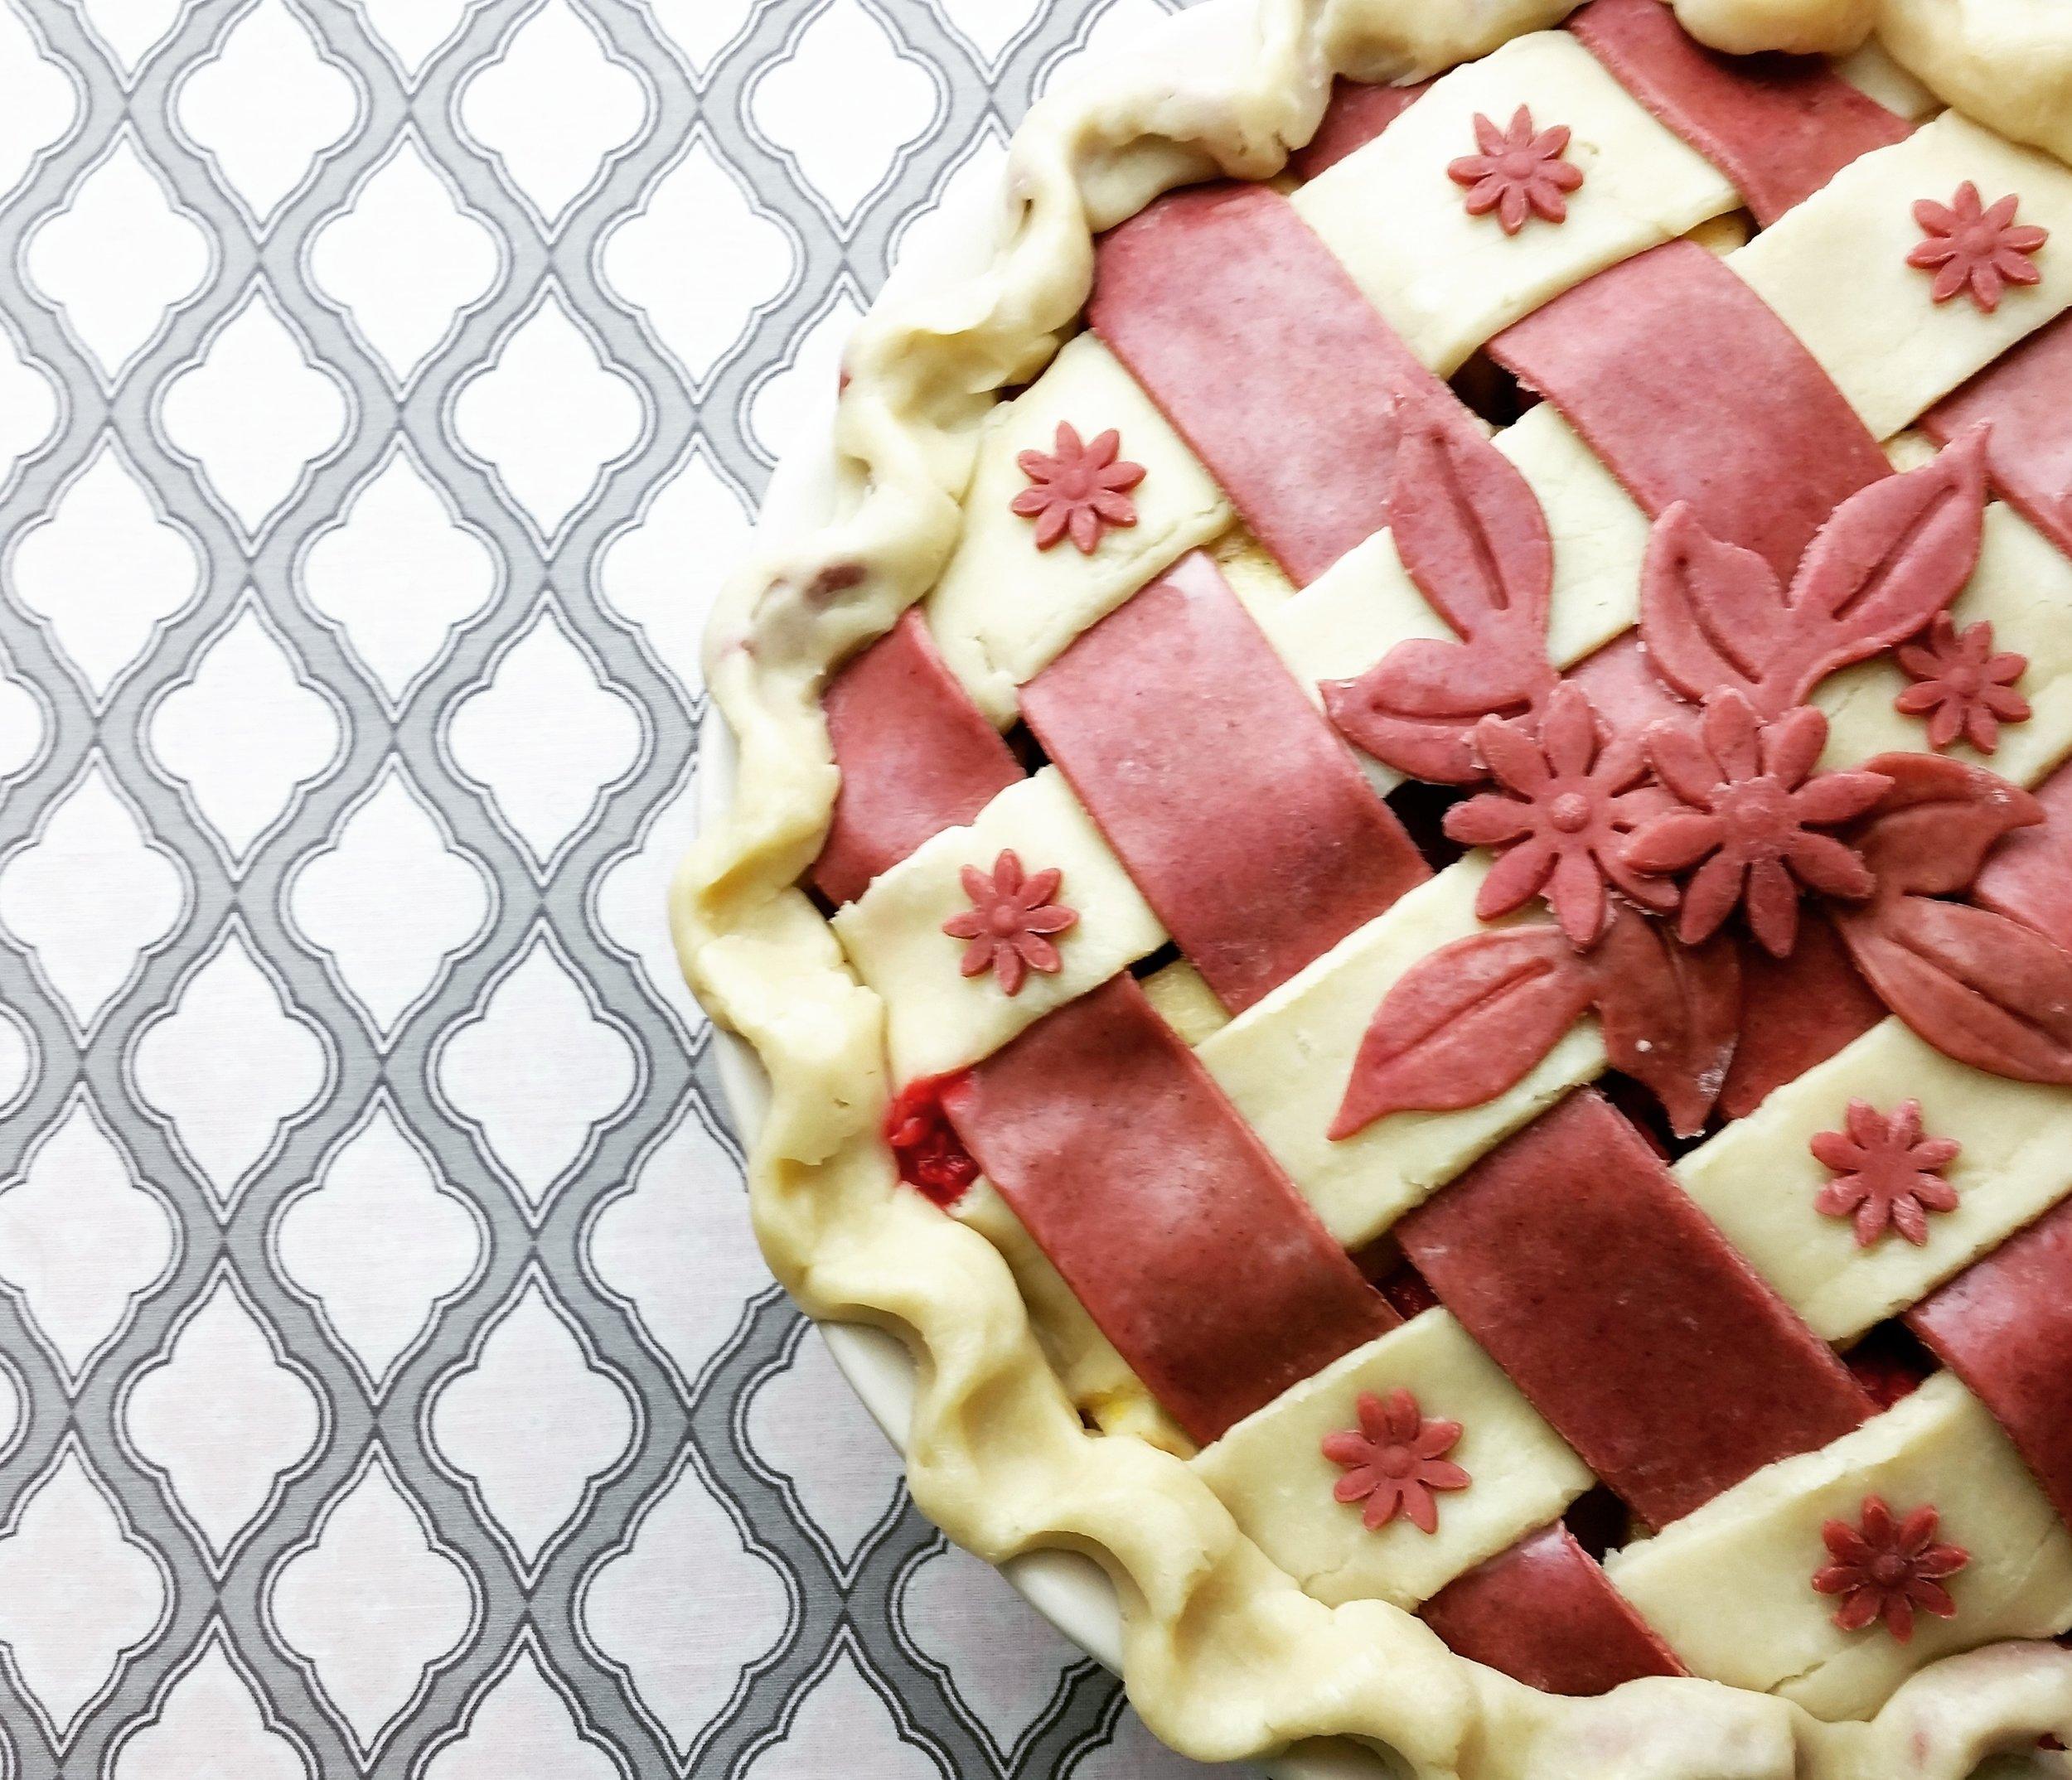 Apple Raspberry Pie with beetroot crust